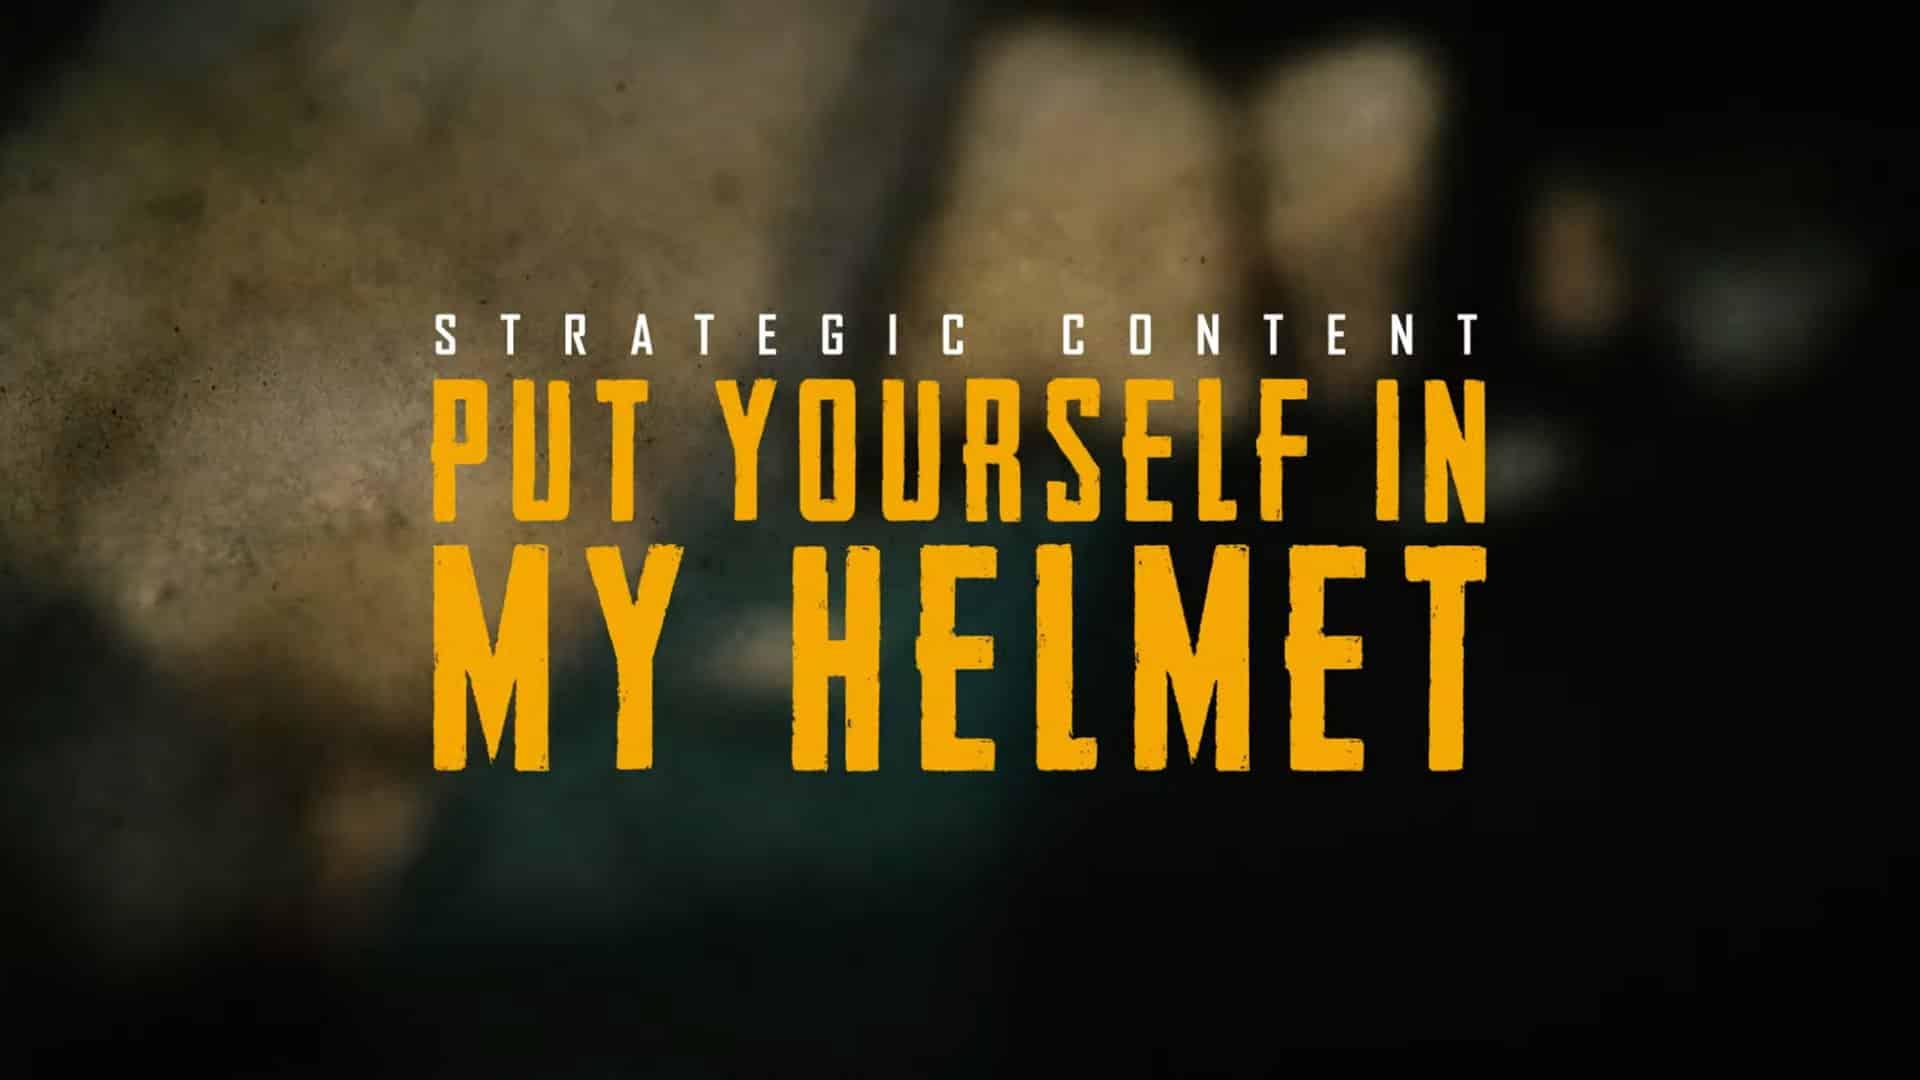 put yourself in my helmet screen yt bab